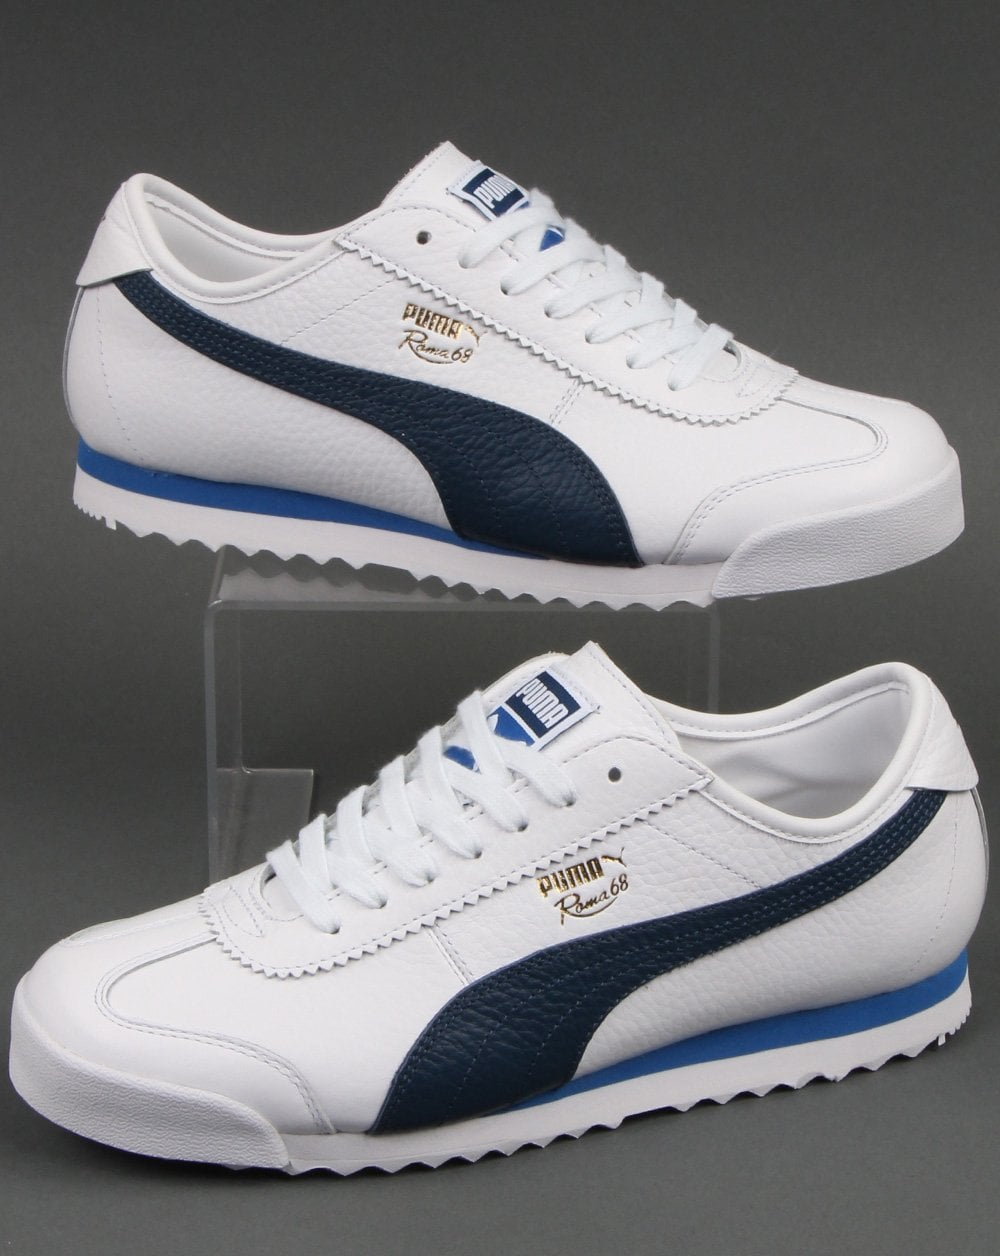 Puma Roma 68 Vintage Trainer White/Dark